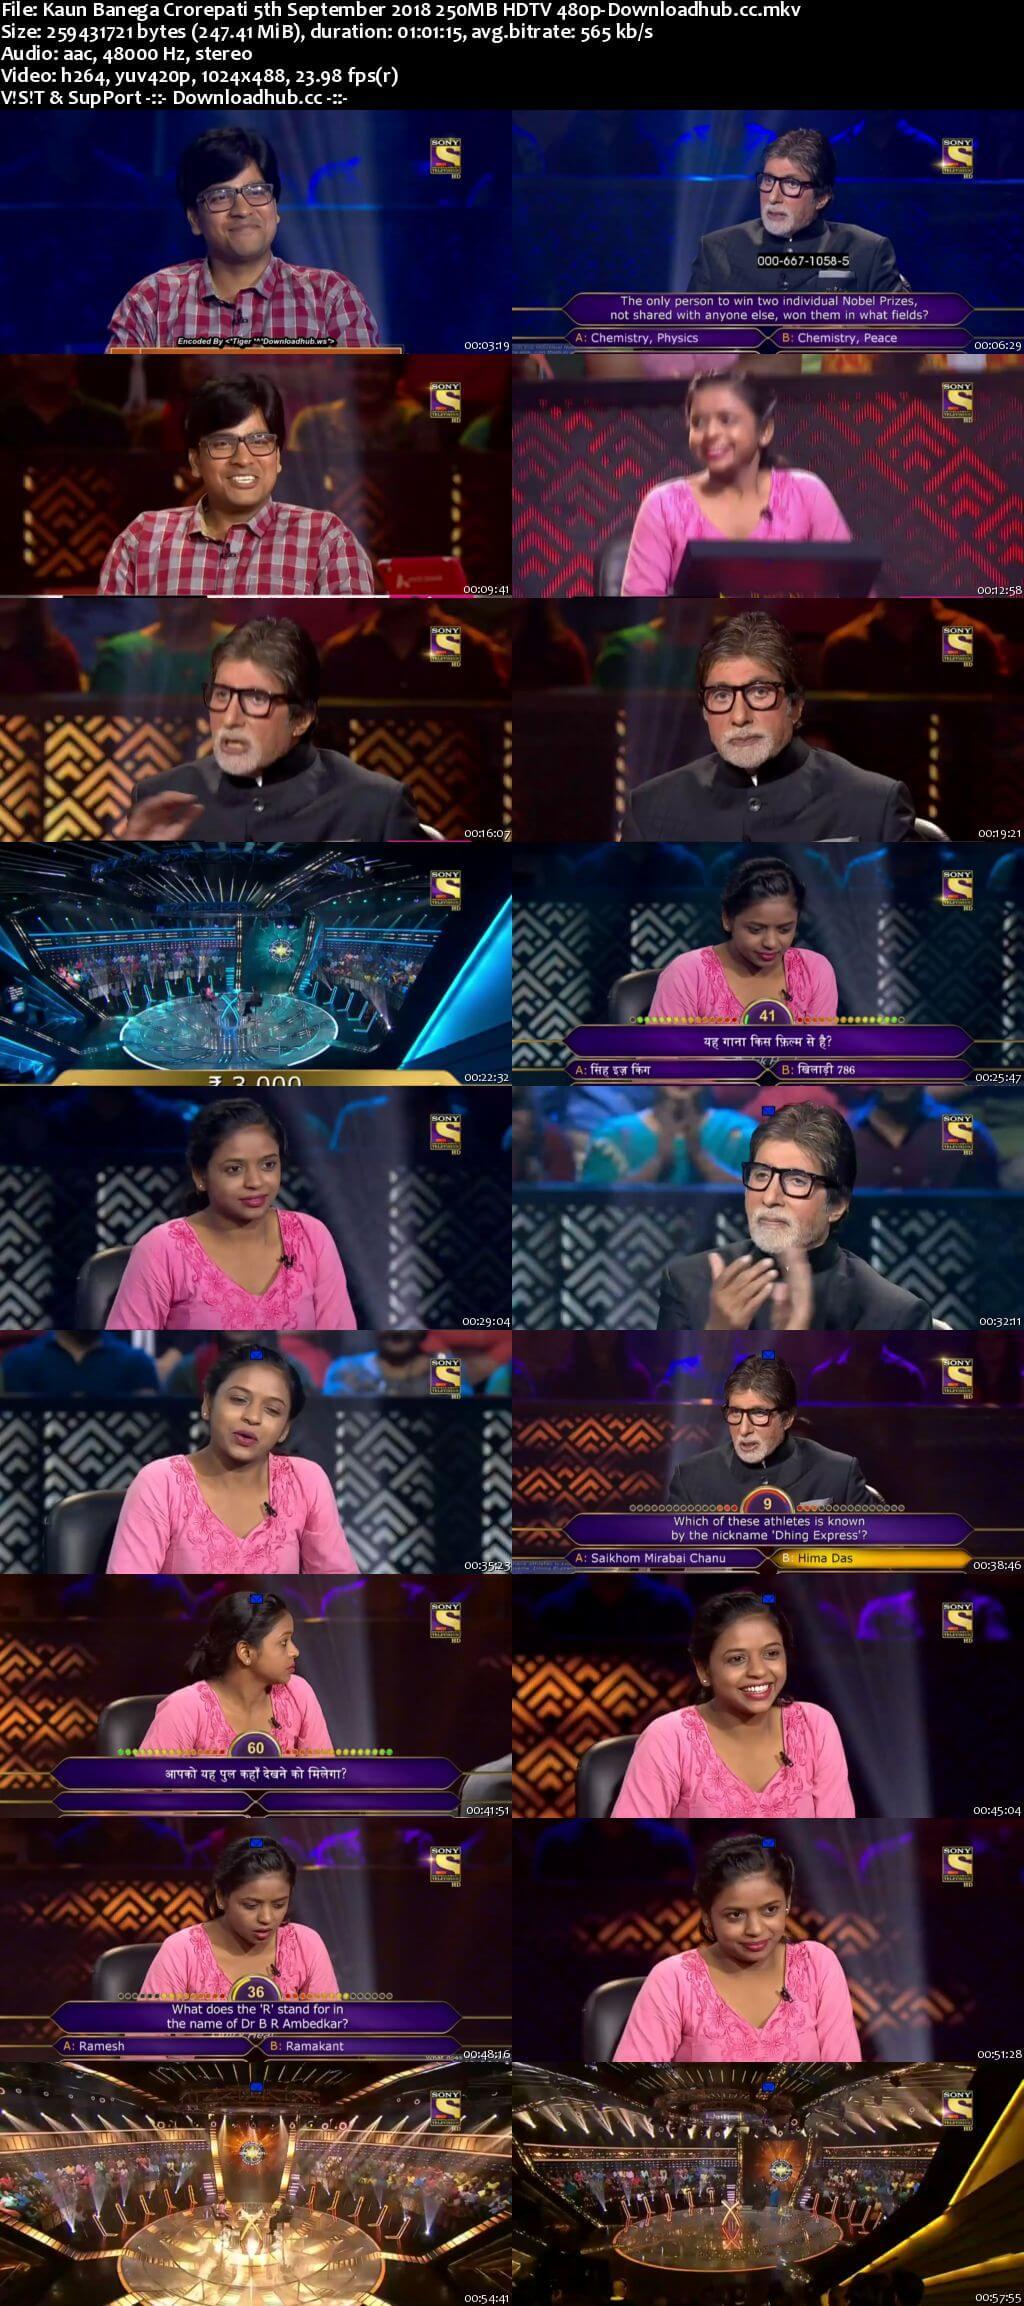 Kaun Banega Crorepati 5th September 2018 250MB HDTV 480p